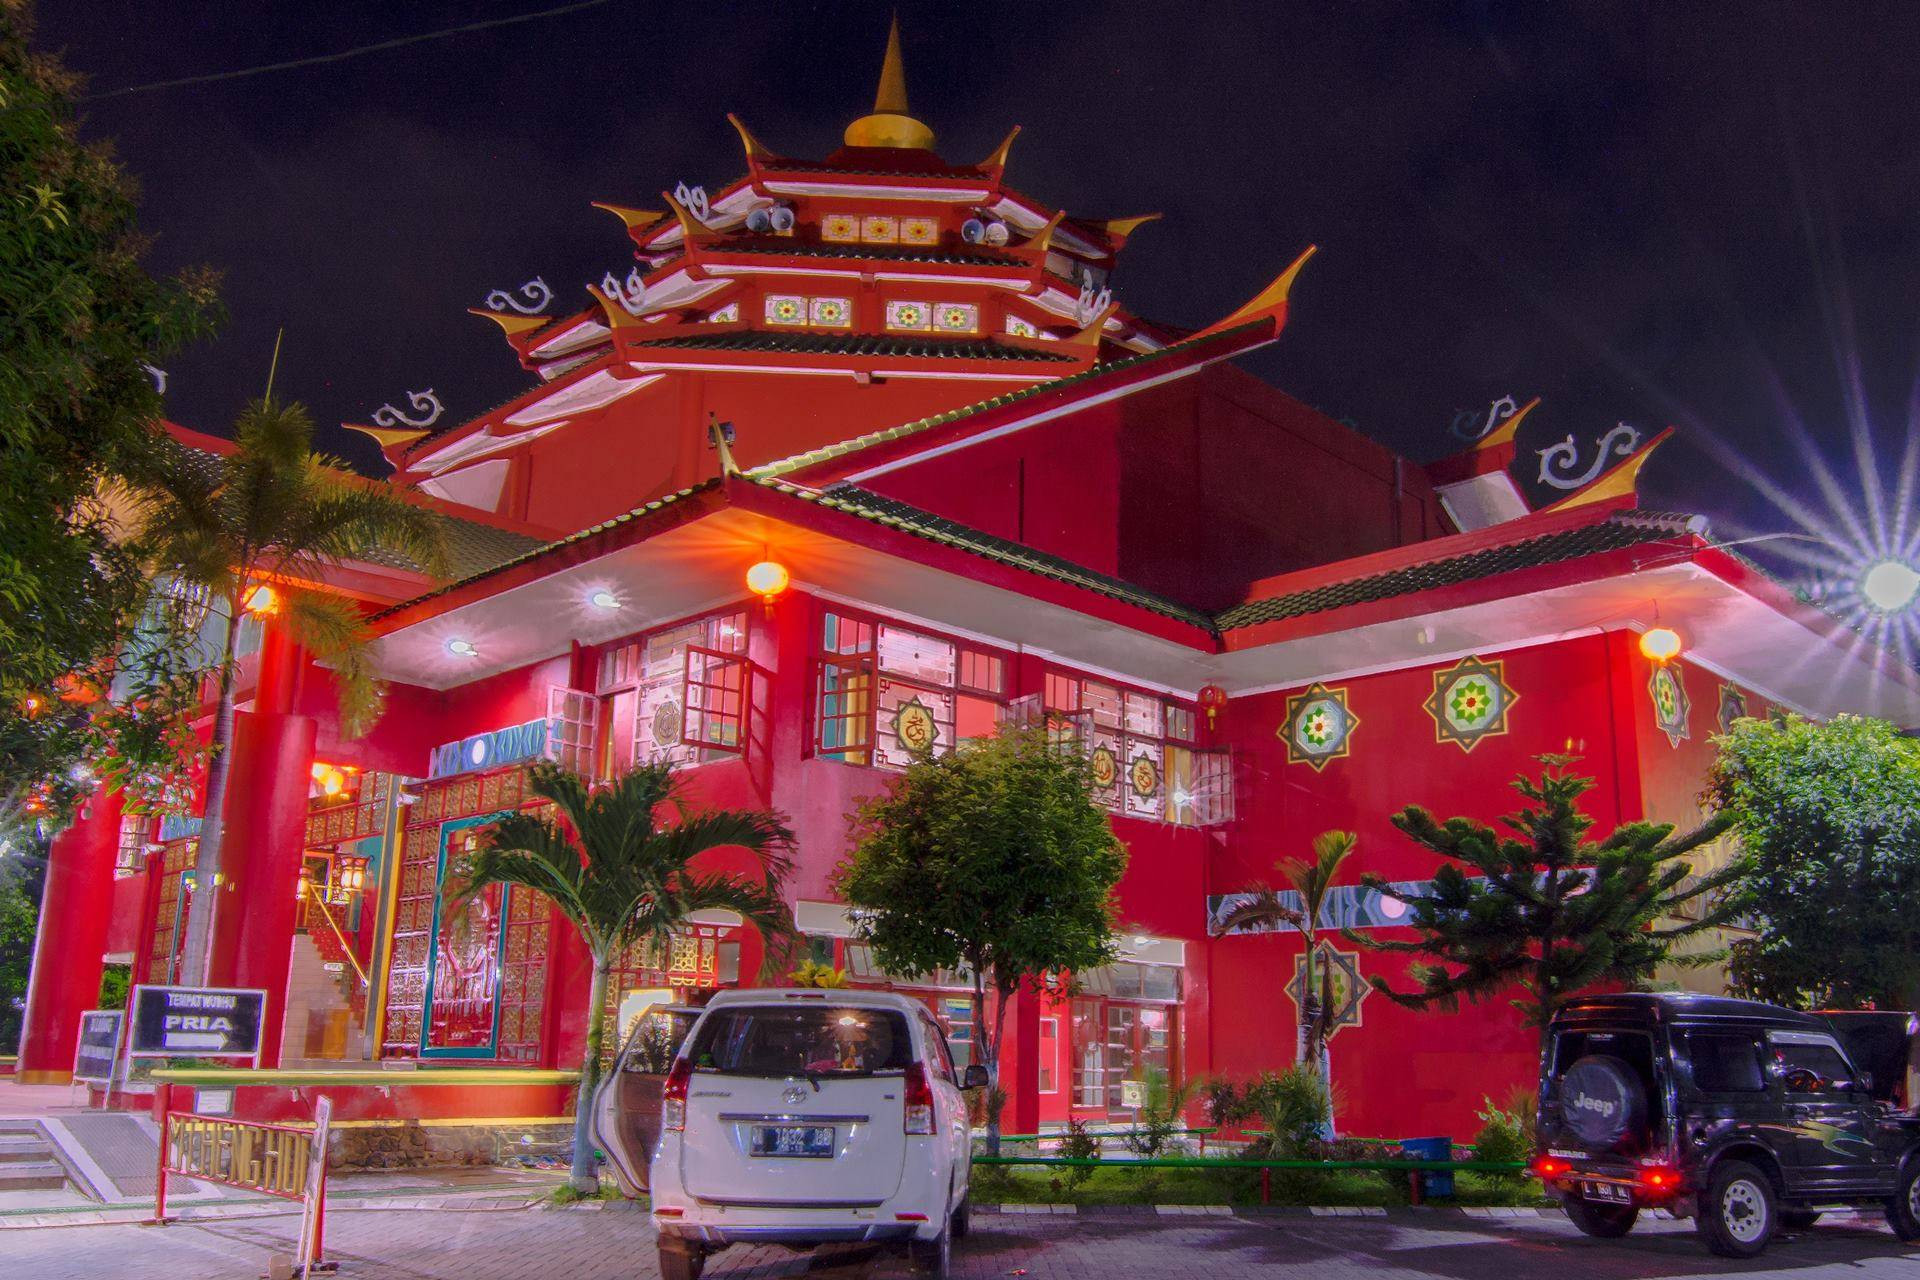 92  Gambar Masjid Cheng Ho Malang Paling Keren